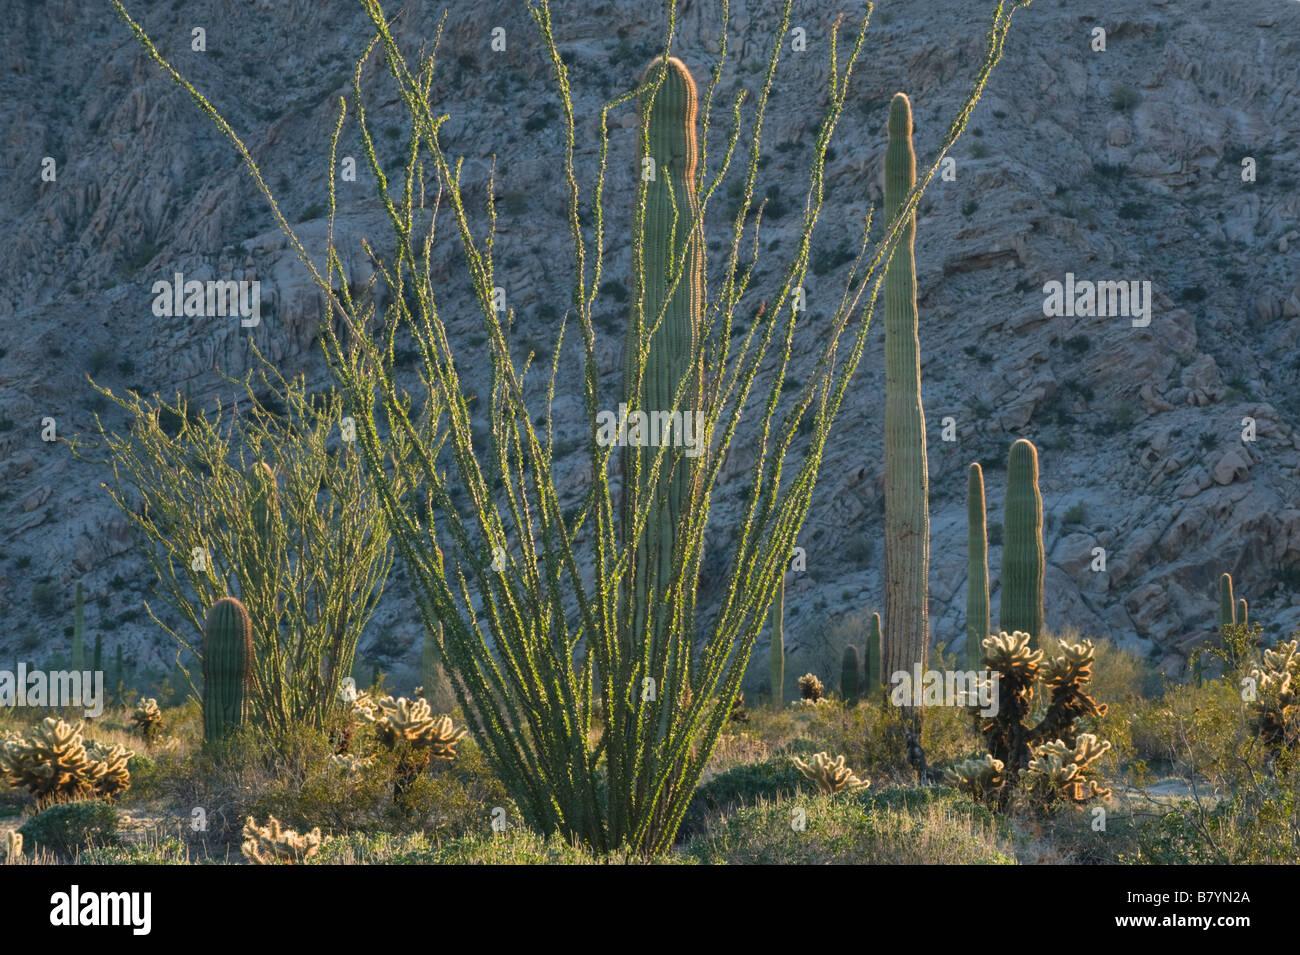 Desert Plants, (Ocotillo, Saguaro, Cholla Cactus) Tinajas Altas Mountains, Barry Goldwater Air Force Range, Arizona - Stock Image